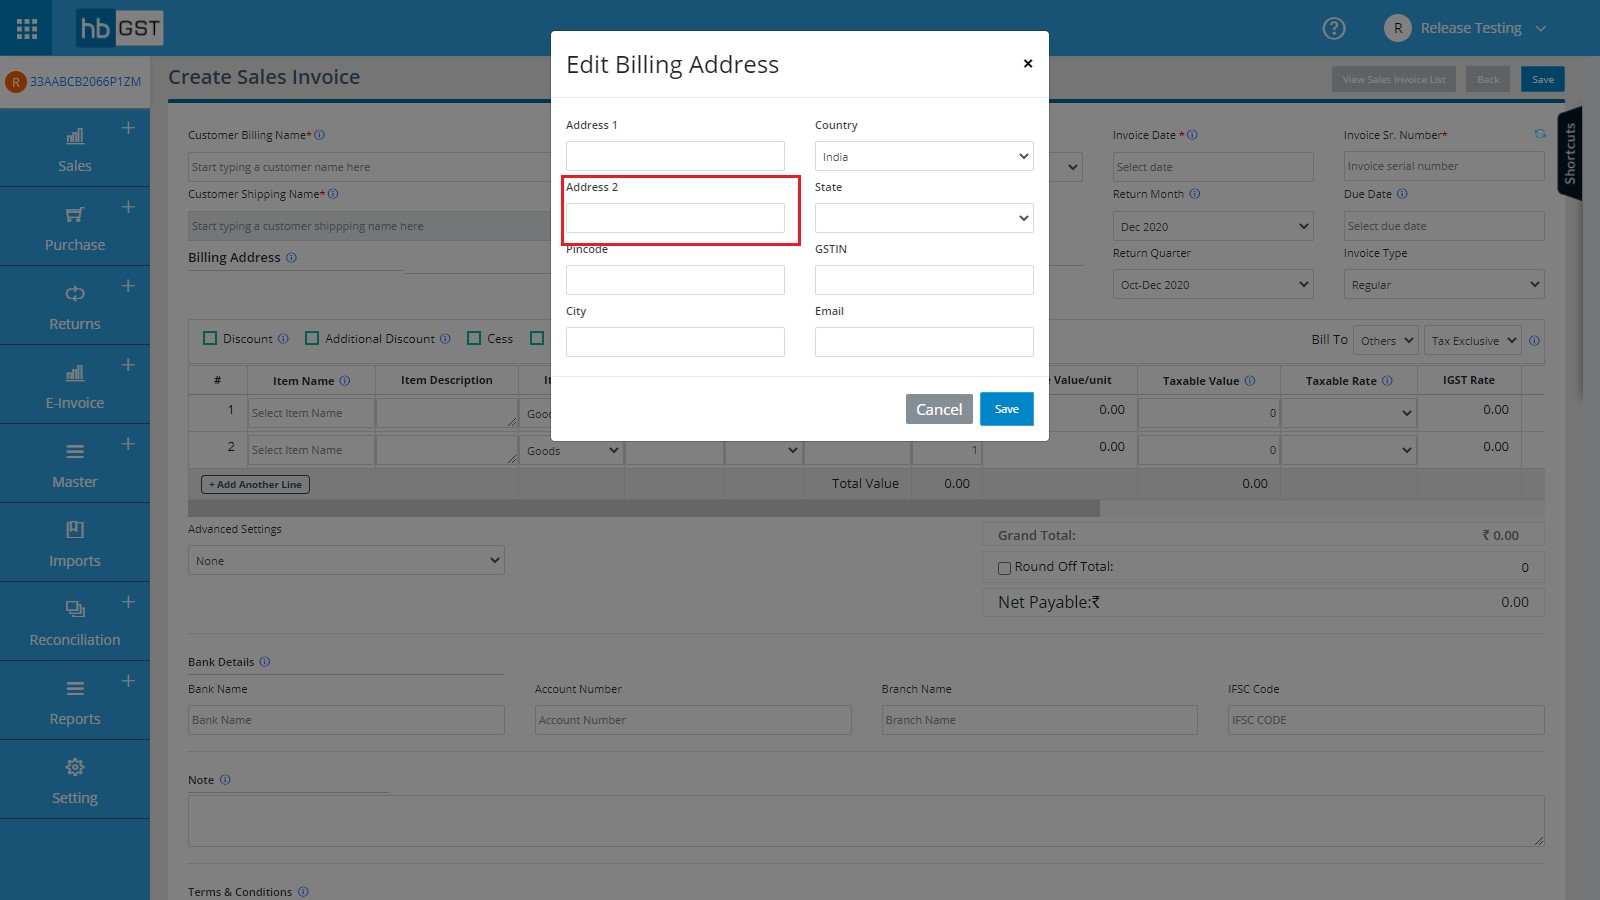 address2-field-in-sales-invoice